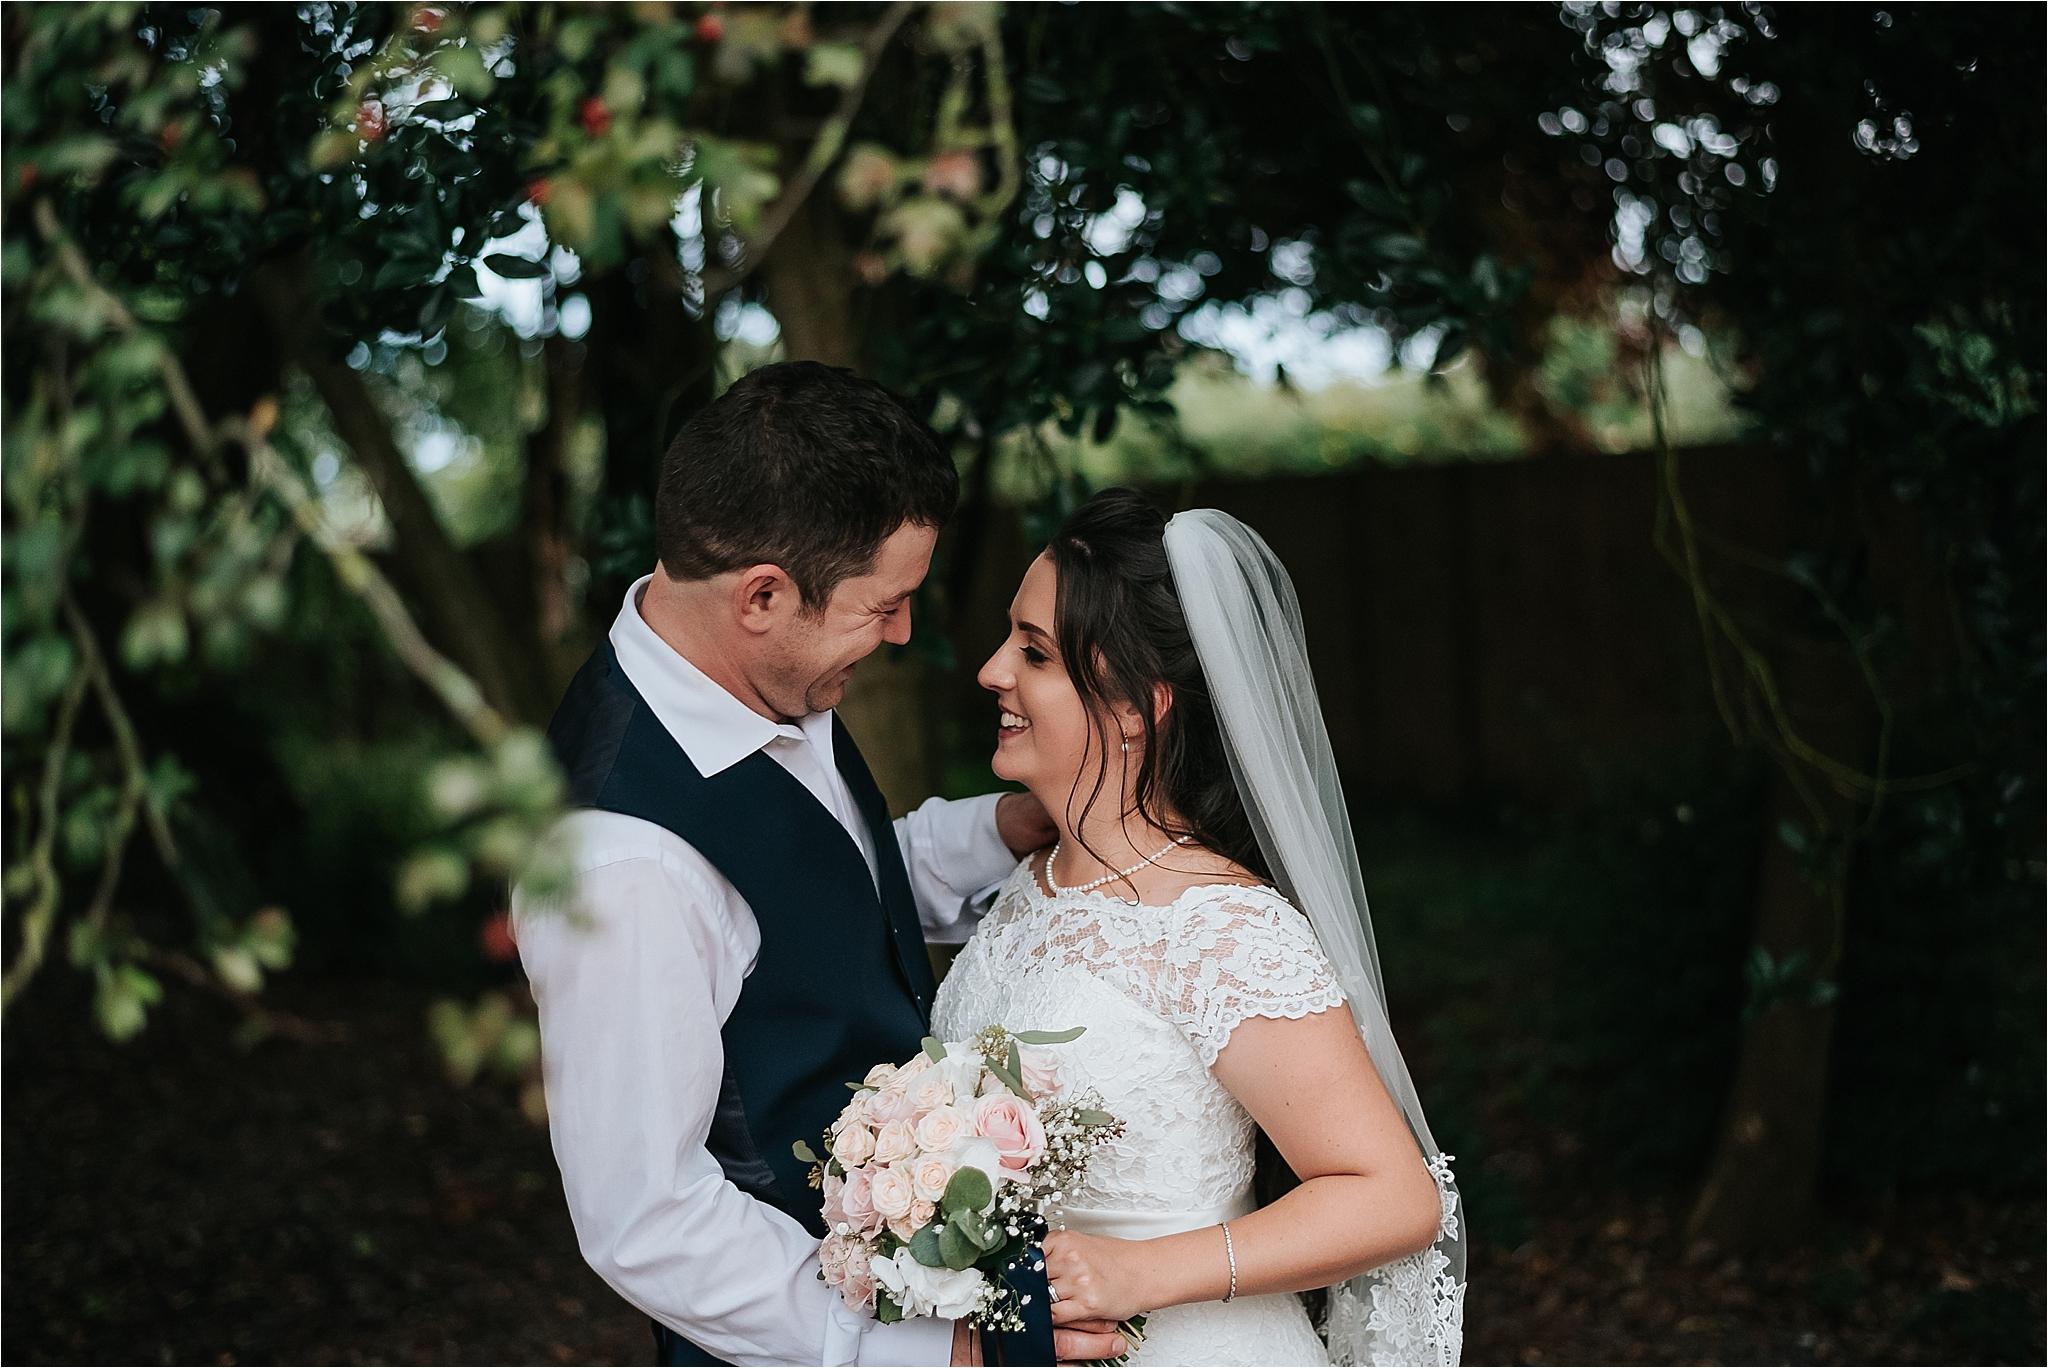 thevilla+lancashire+wreagreen+wedding+photographer61.jpg